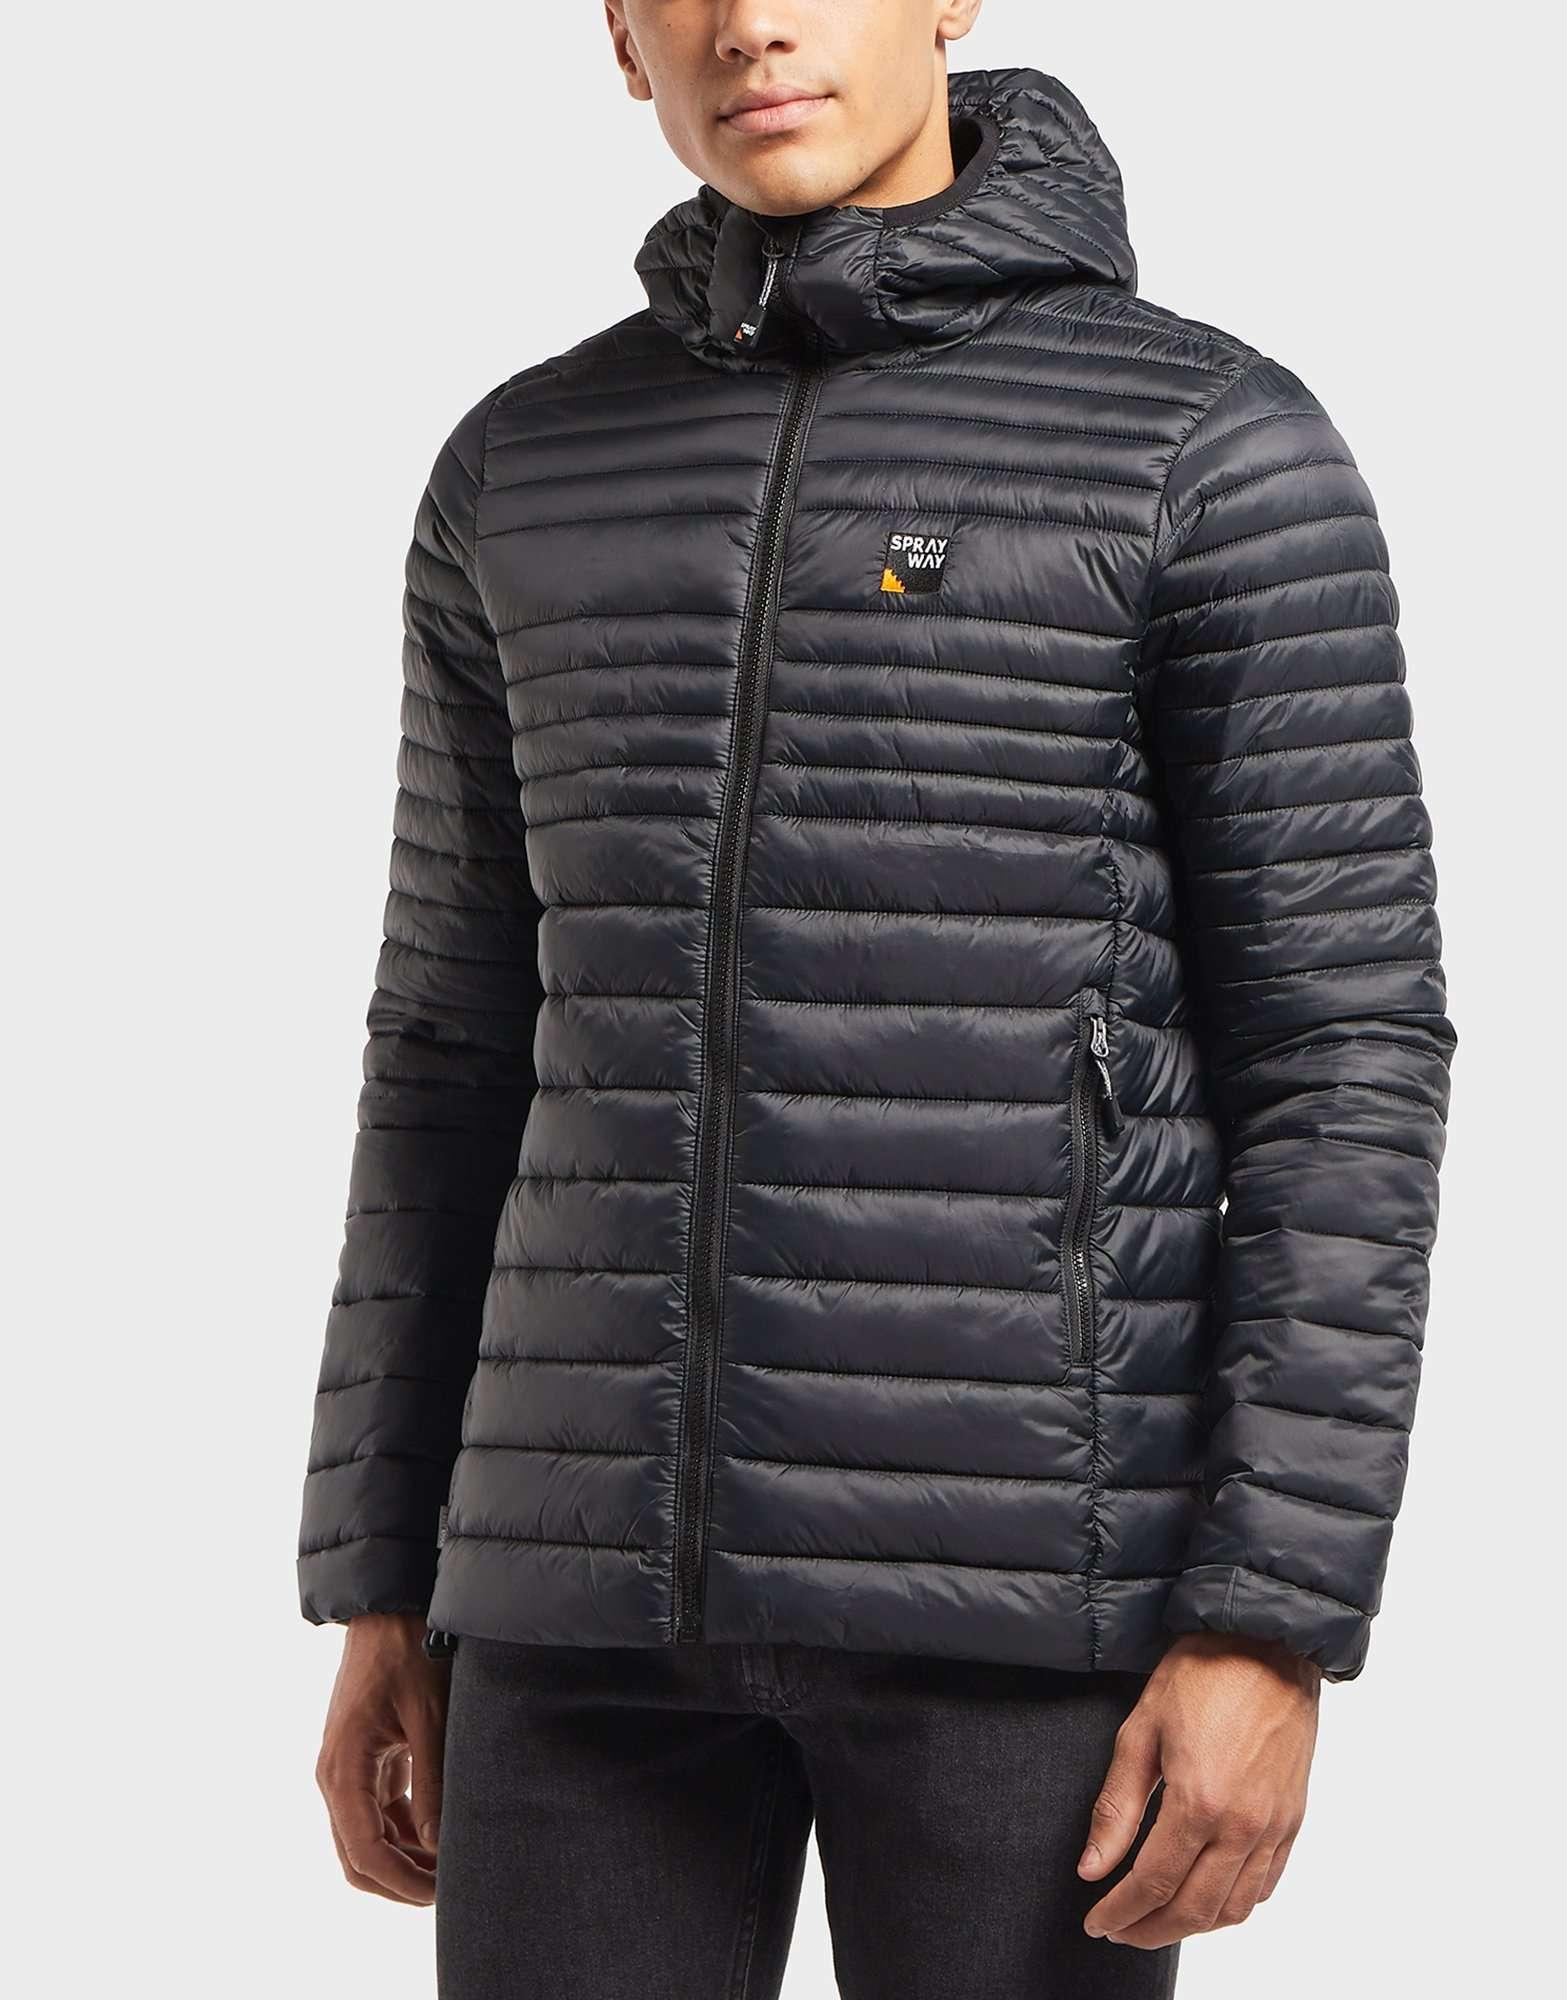 Sprayway Rador Baffle Synthetic Jacket